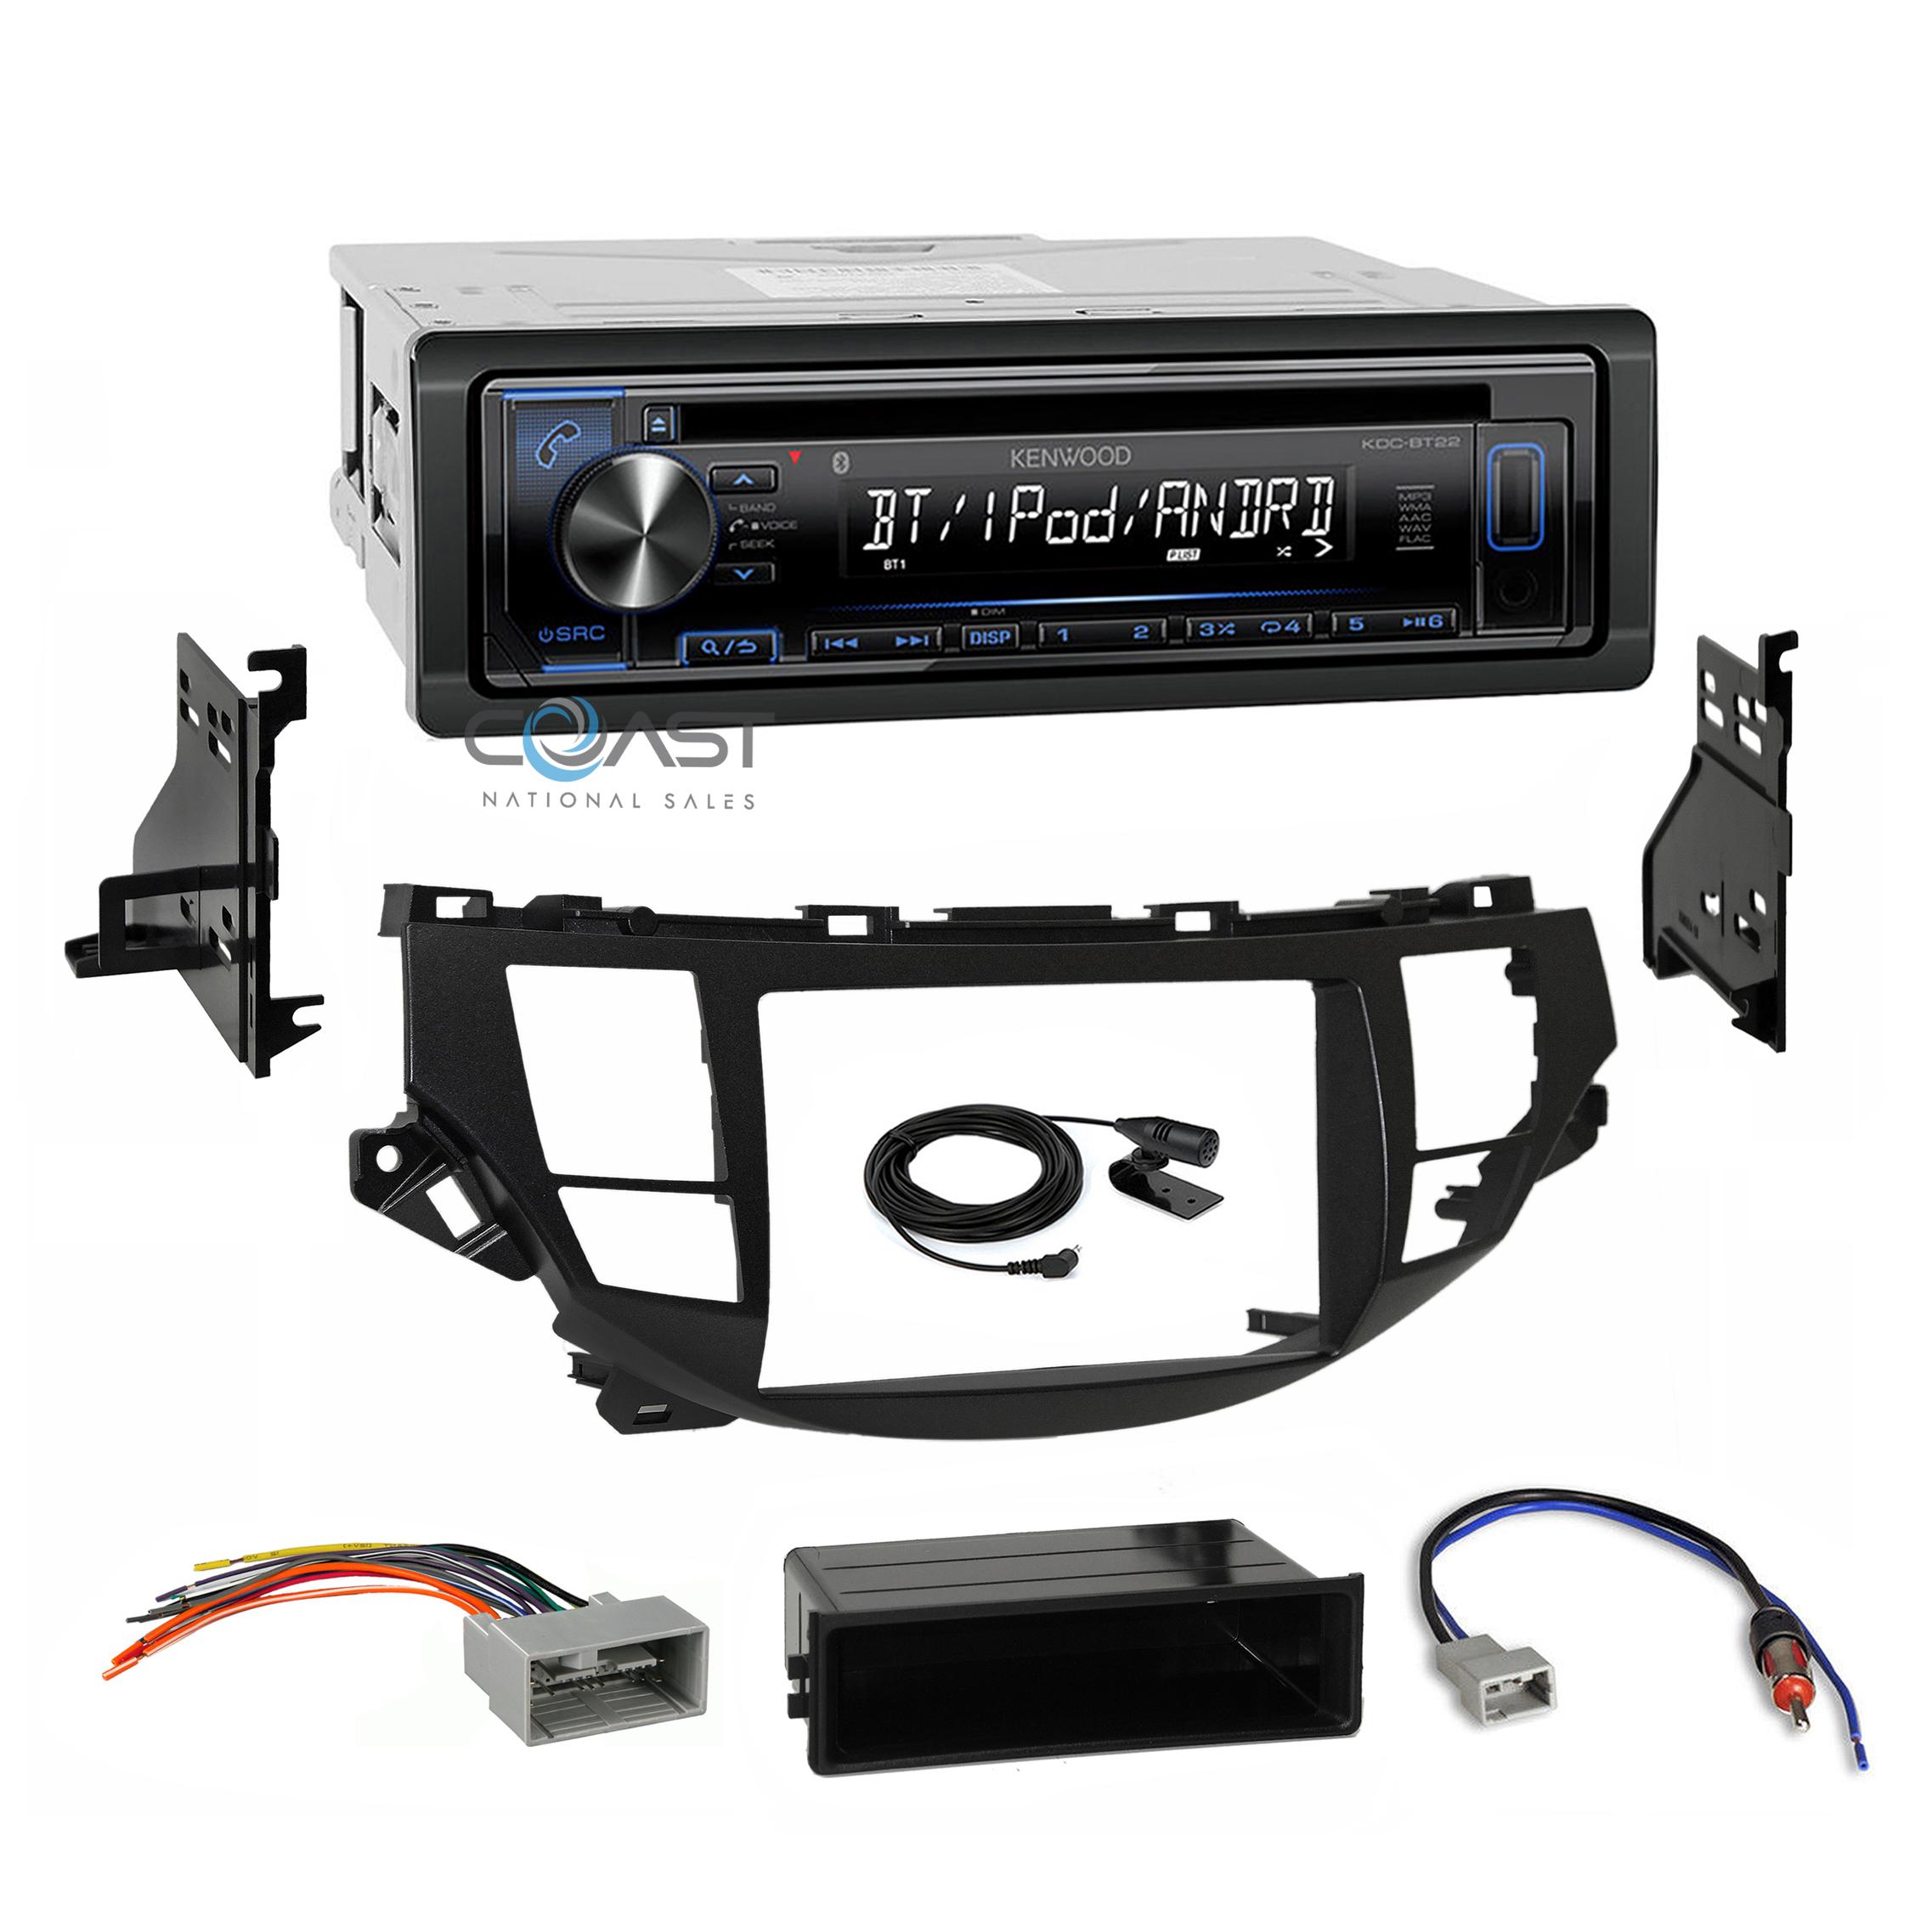 Kenwood Double Din CD Player Receiver W// Honda Accord Installation Dash Kit